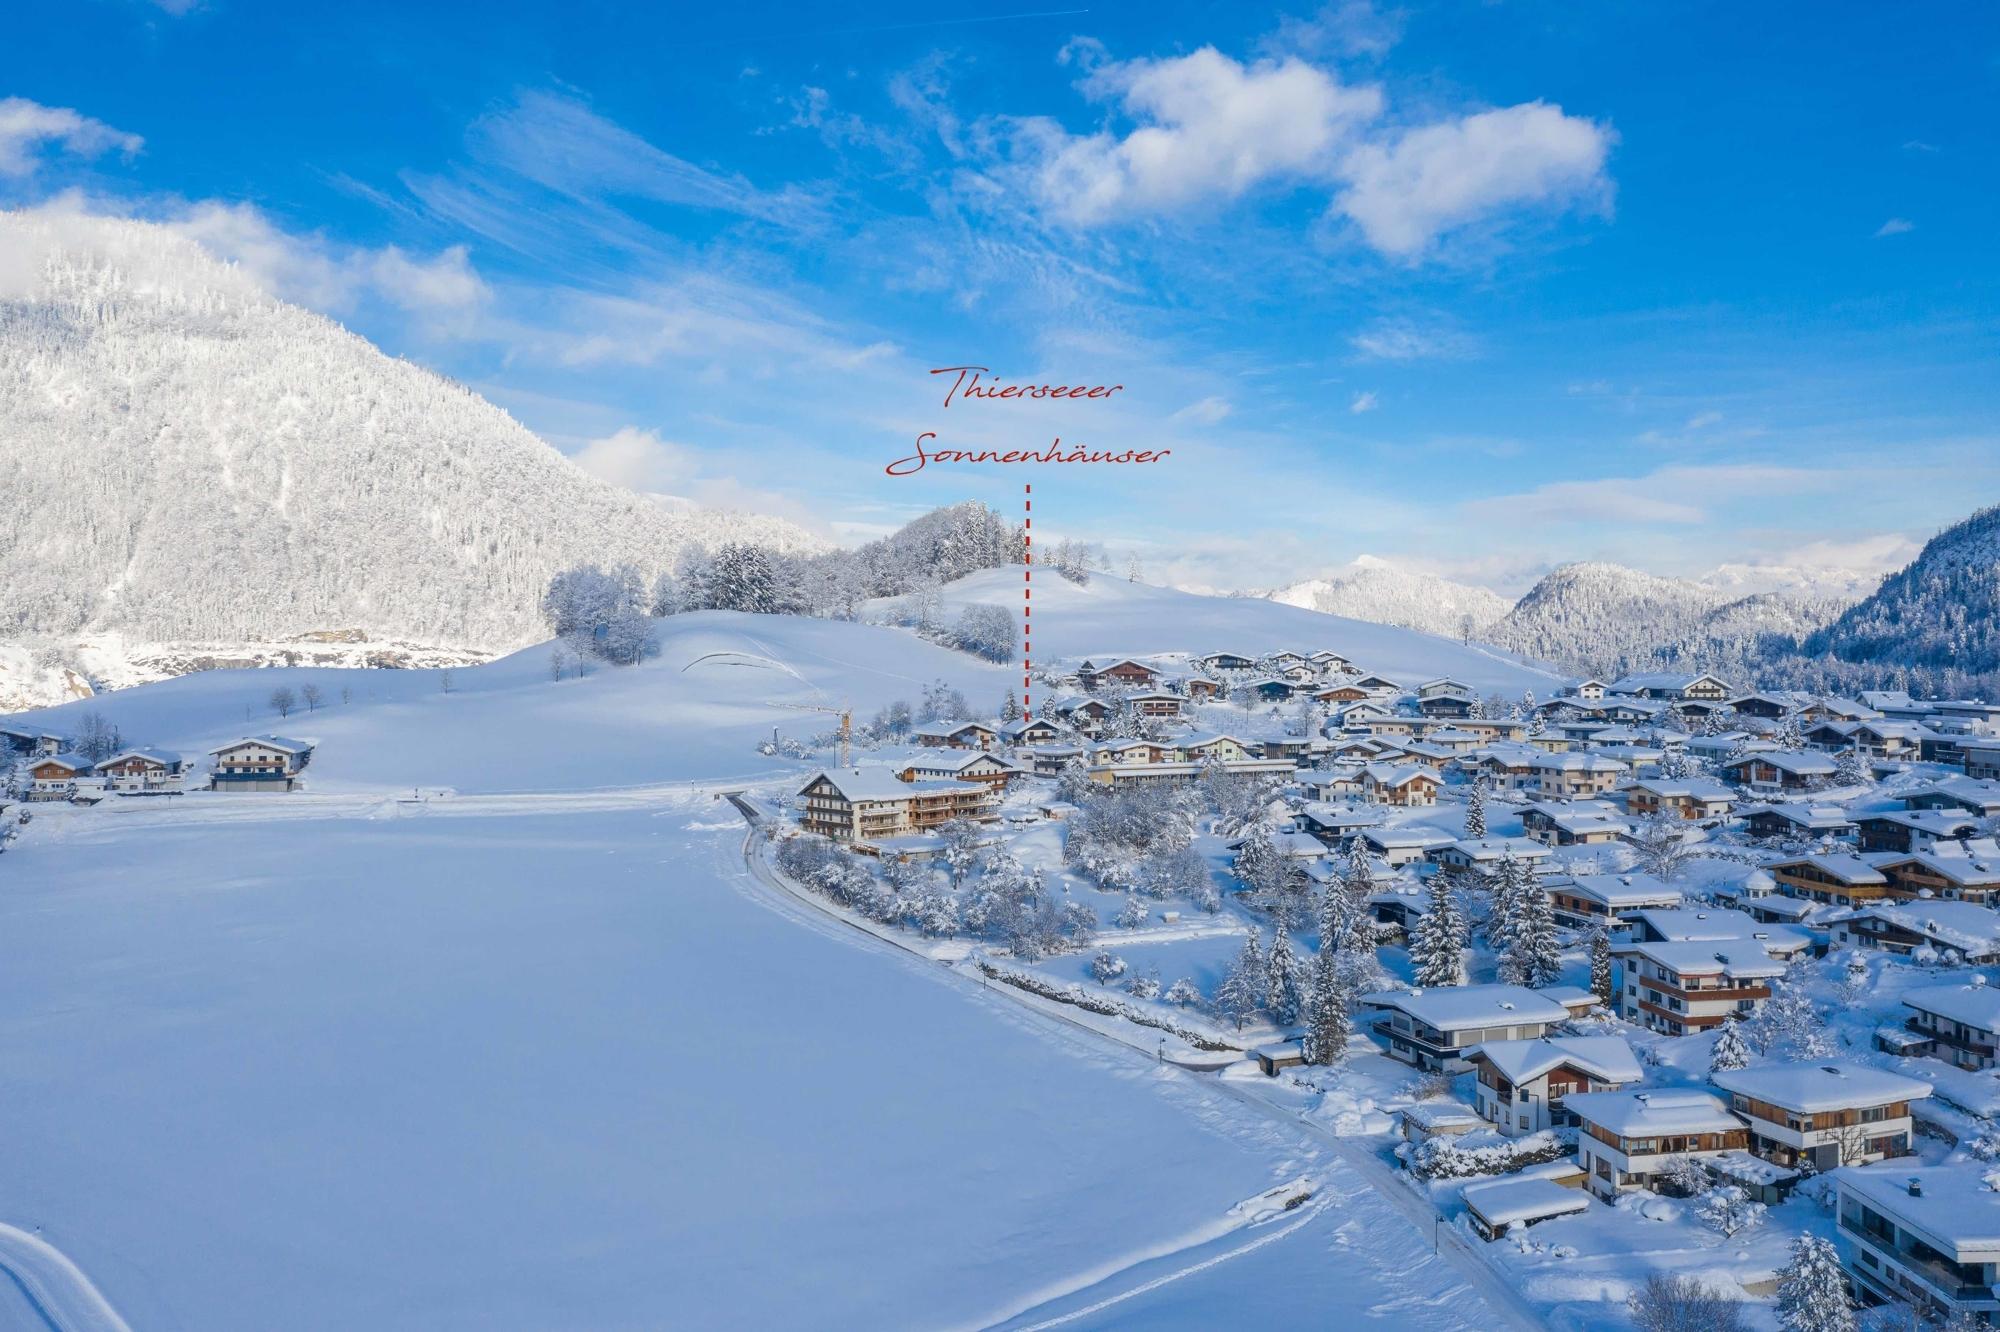 Lage : Winter